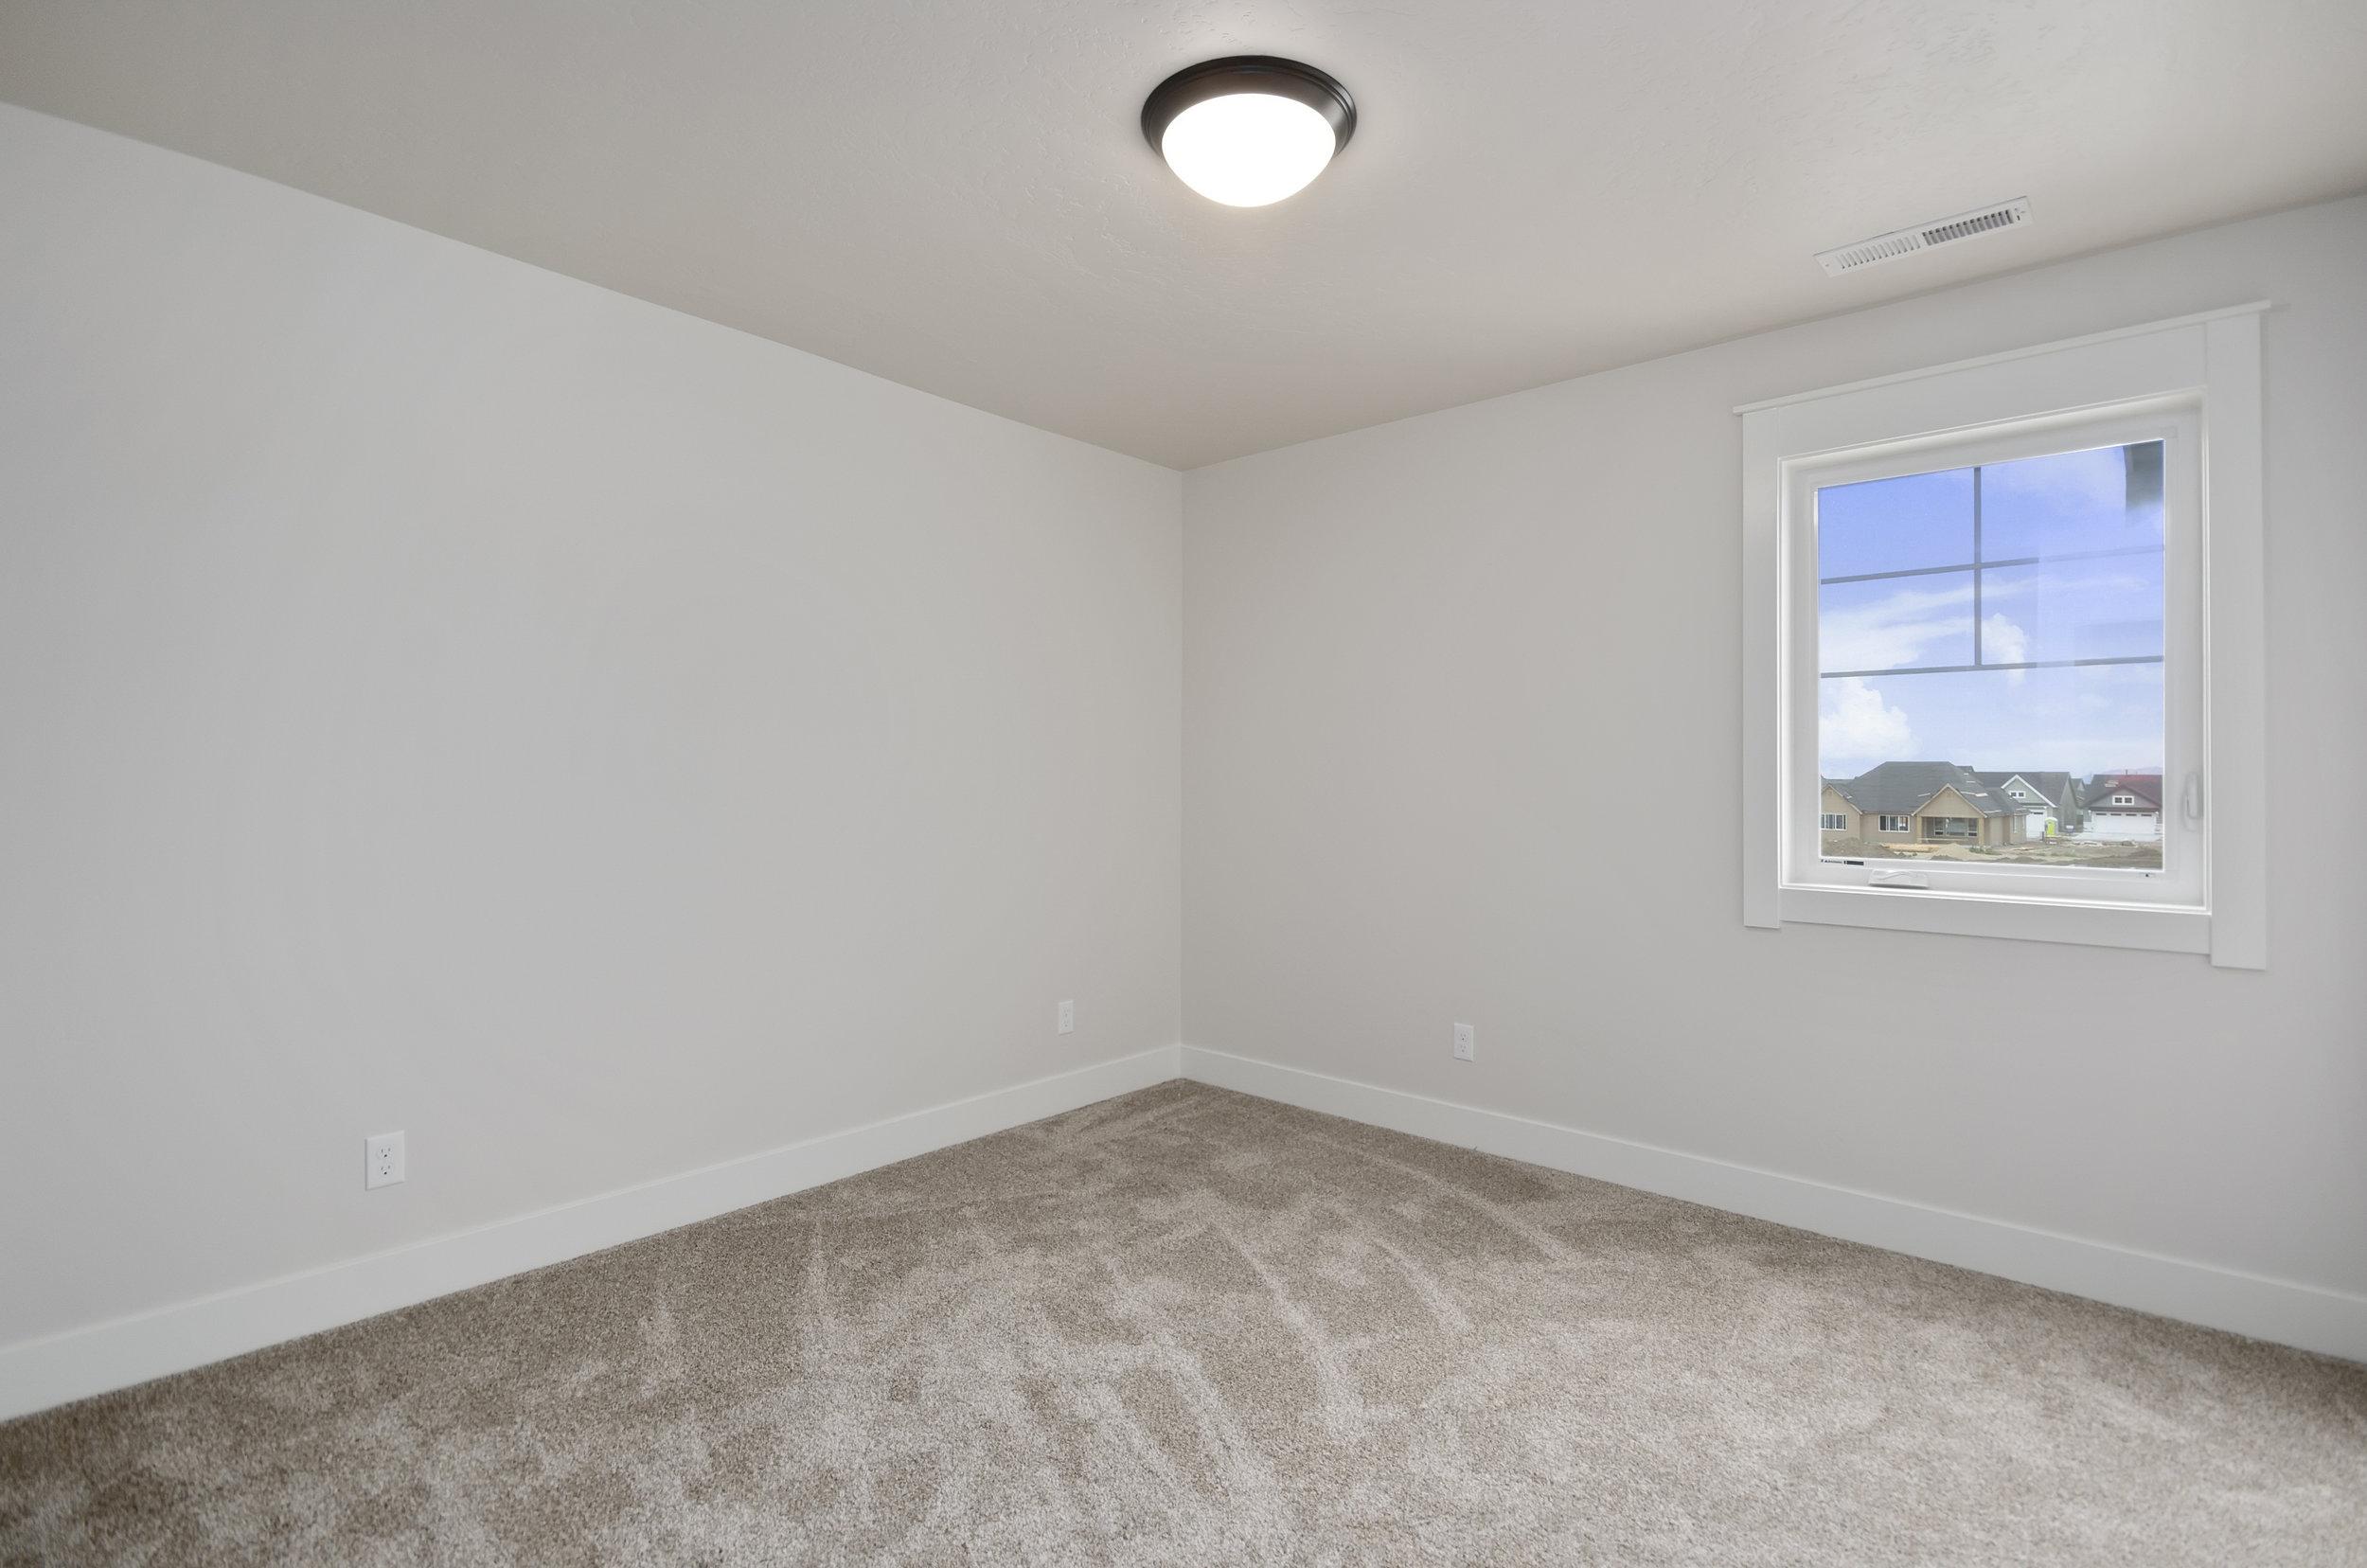 35-Bedroom.jpg